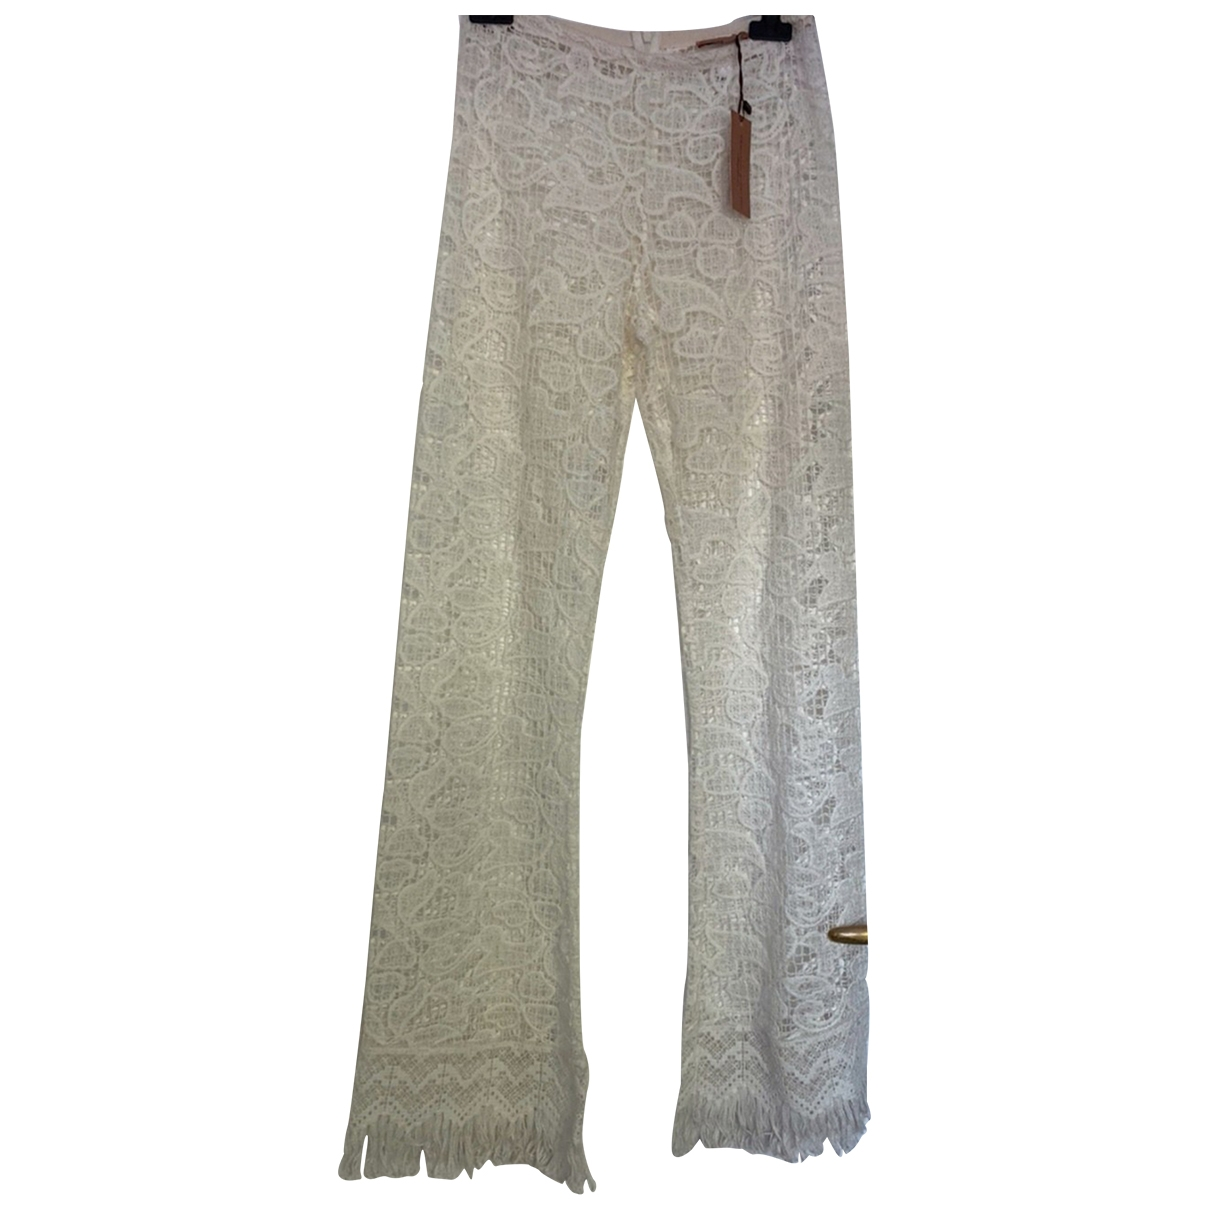 Ermanno Scervino \N Beige Cotton Trousers for Women 40 IT